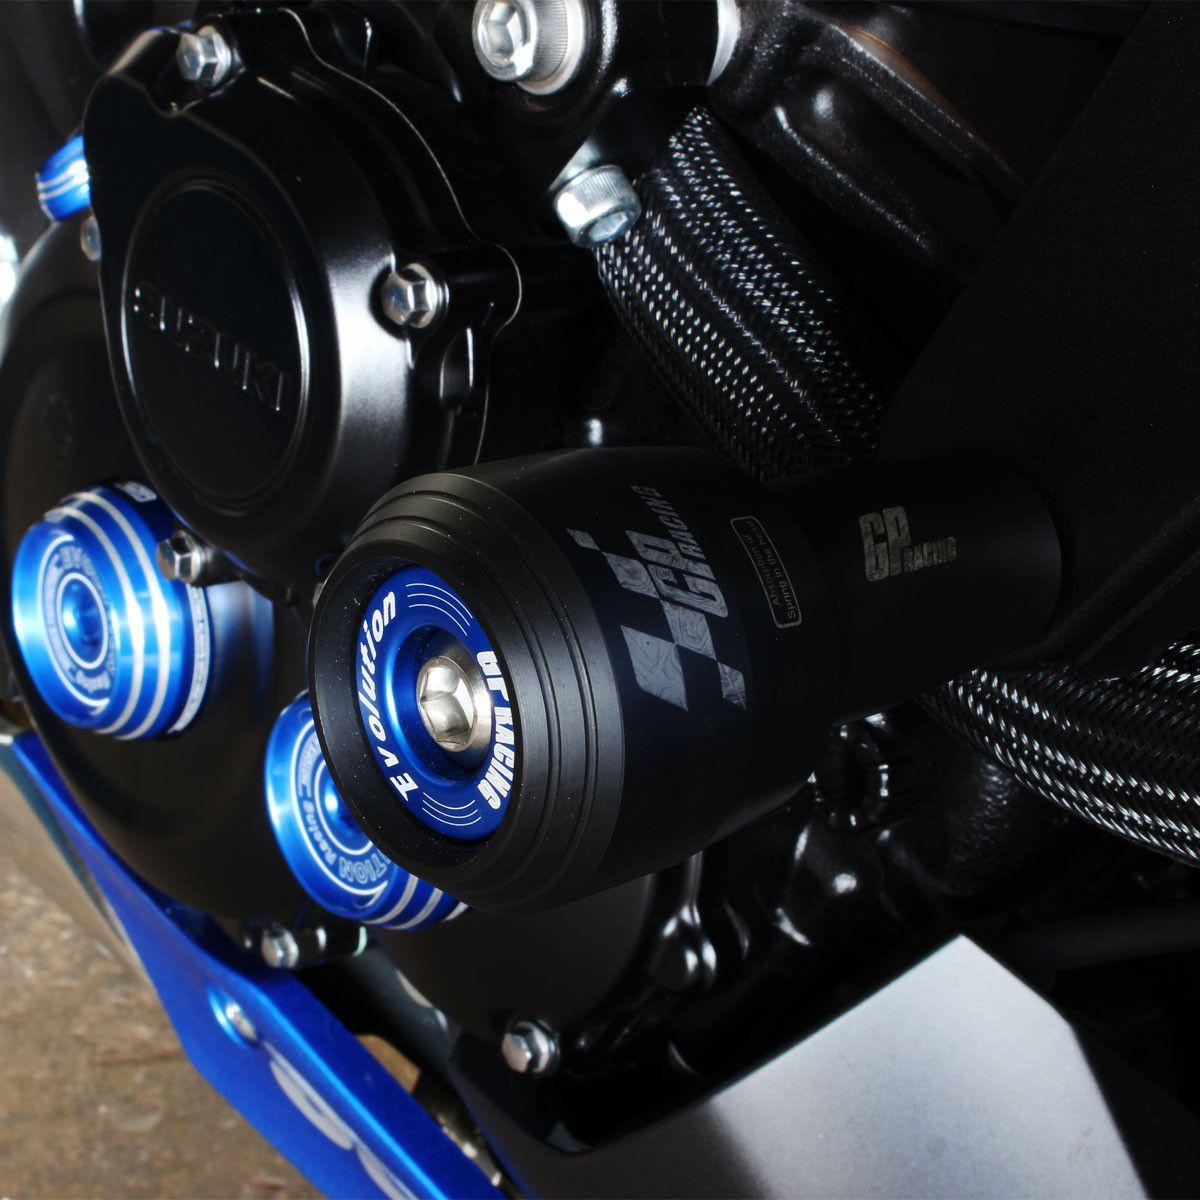 Slider Evolution GP Nylon Honda CBR1000RR CBR1000 RR 04 07